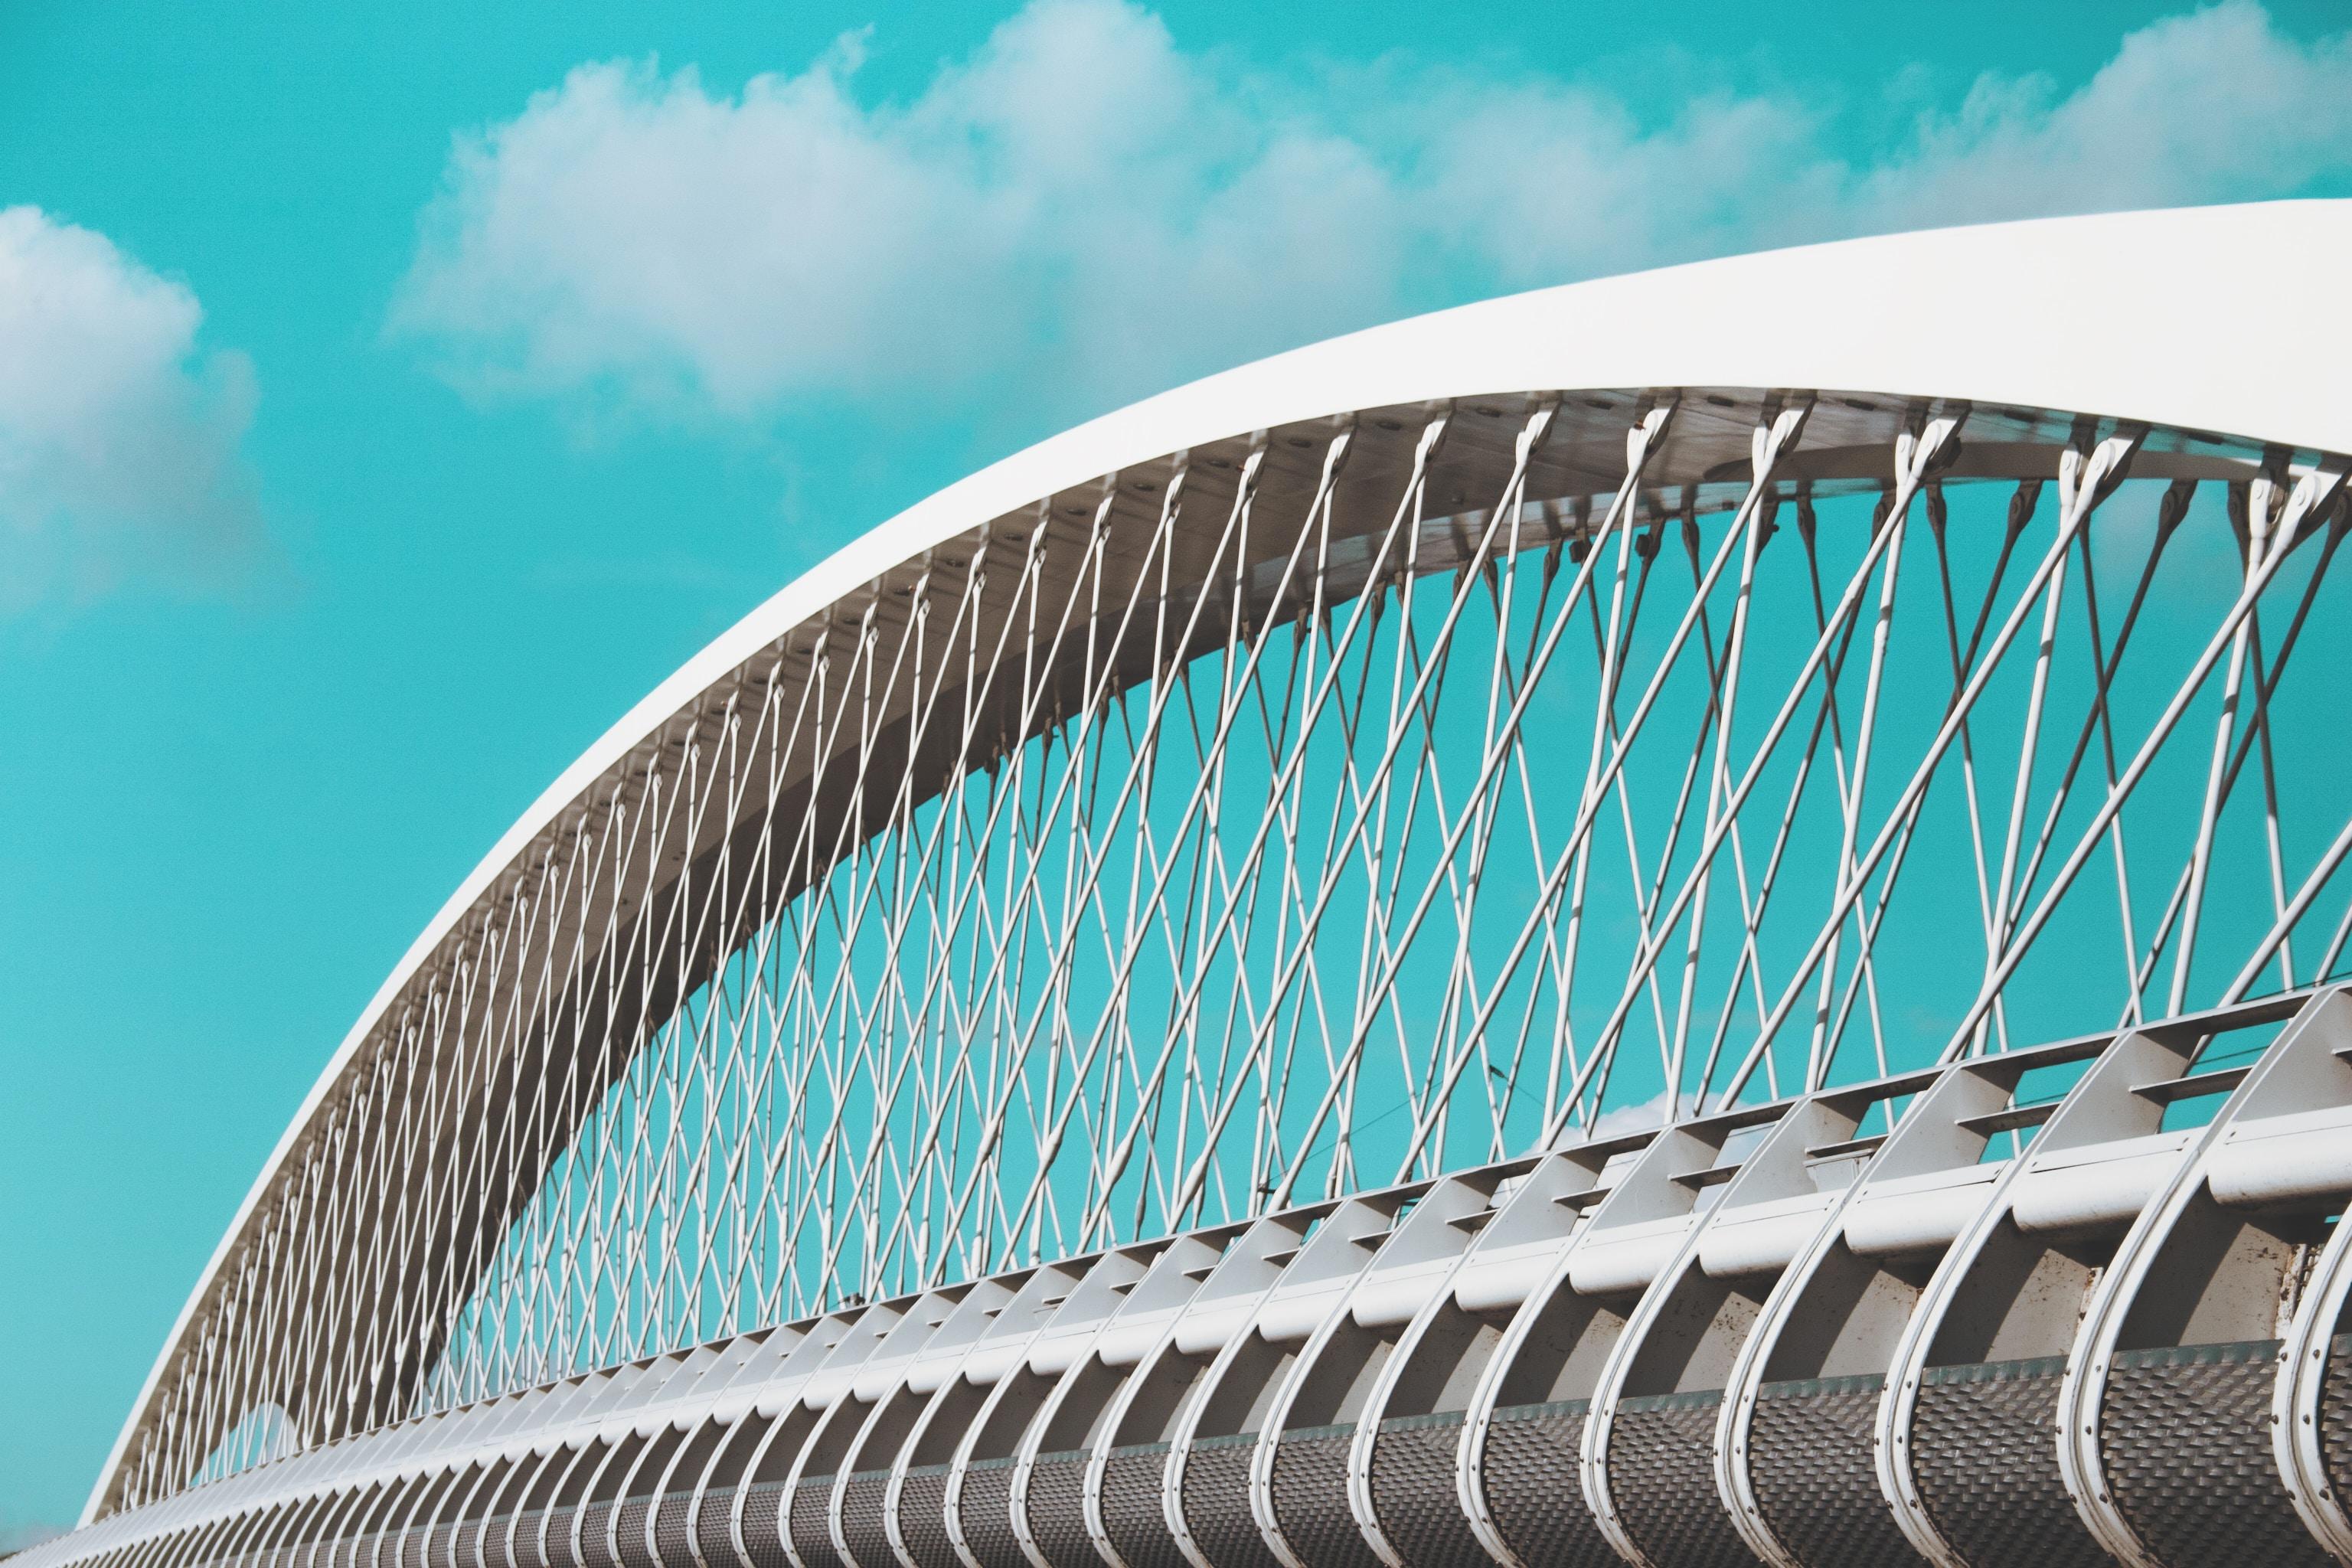 white suspension bridge under blue sky